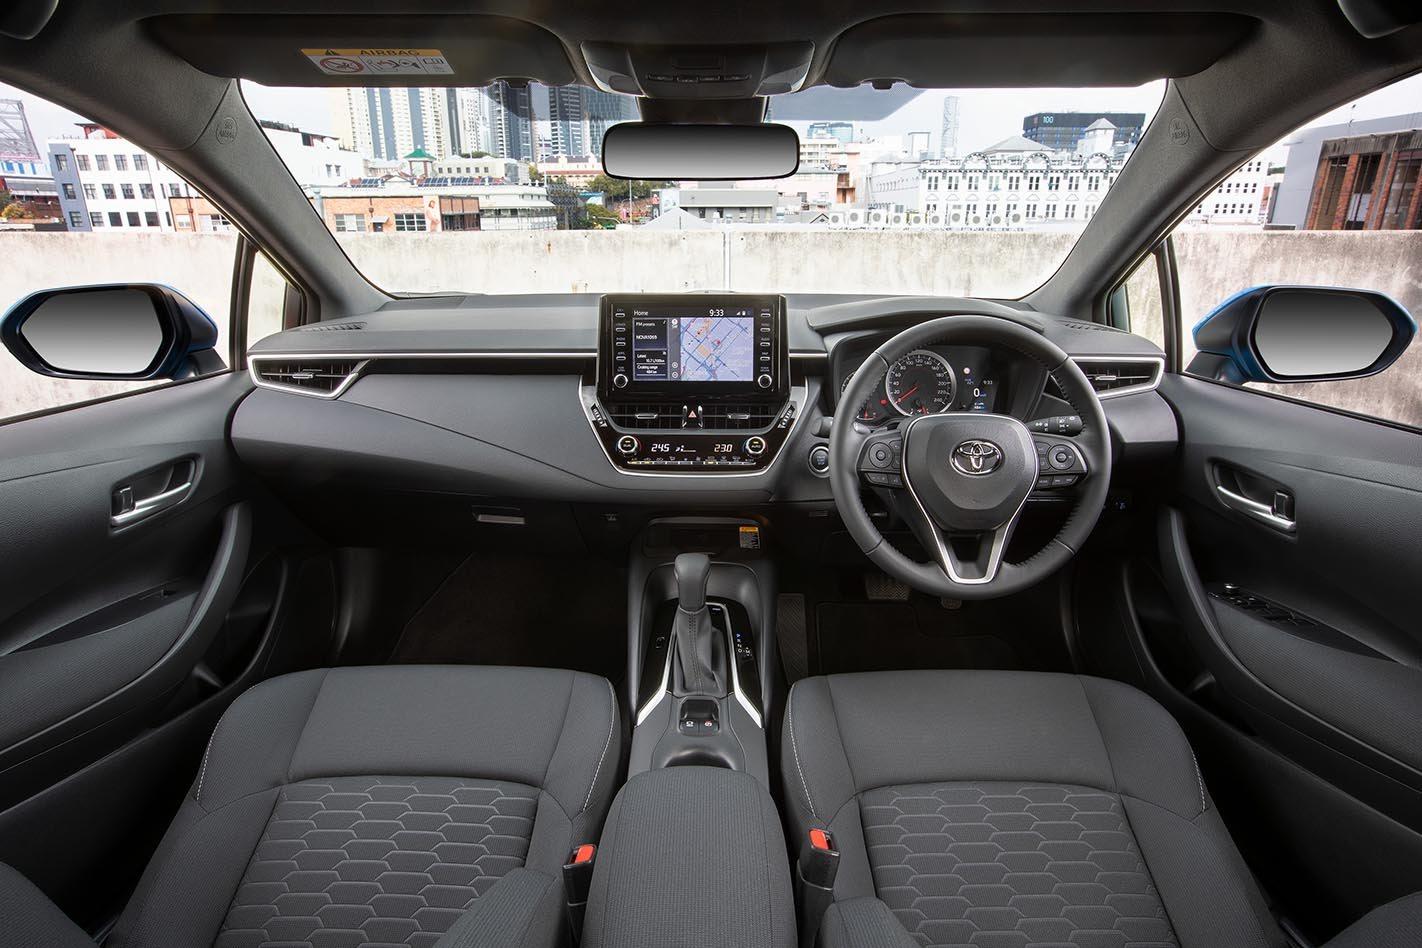 2018 Toyota Corolla hatchback interior